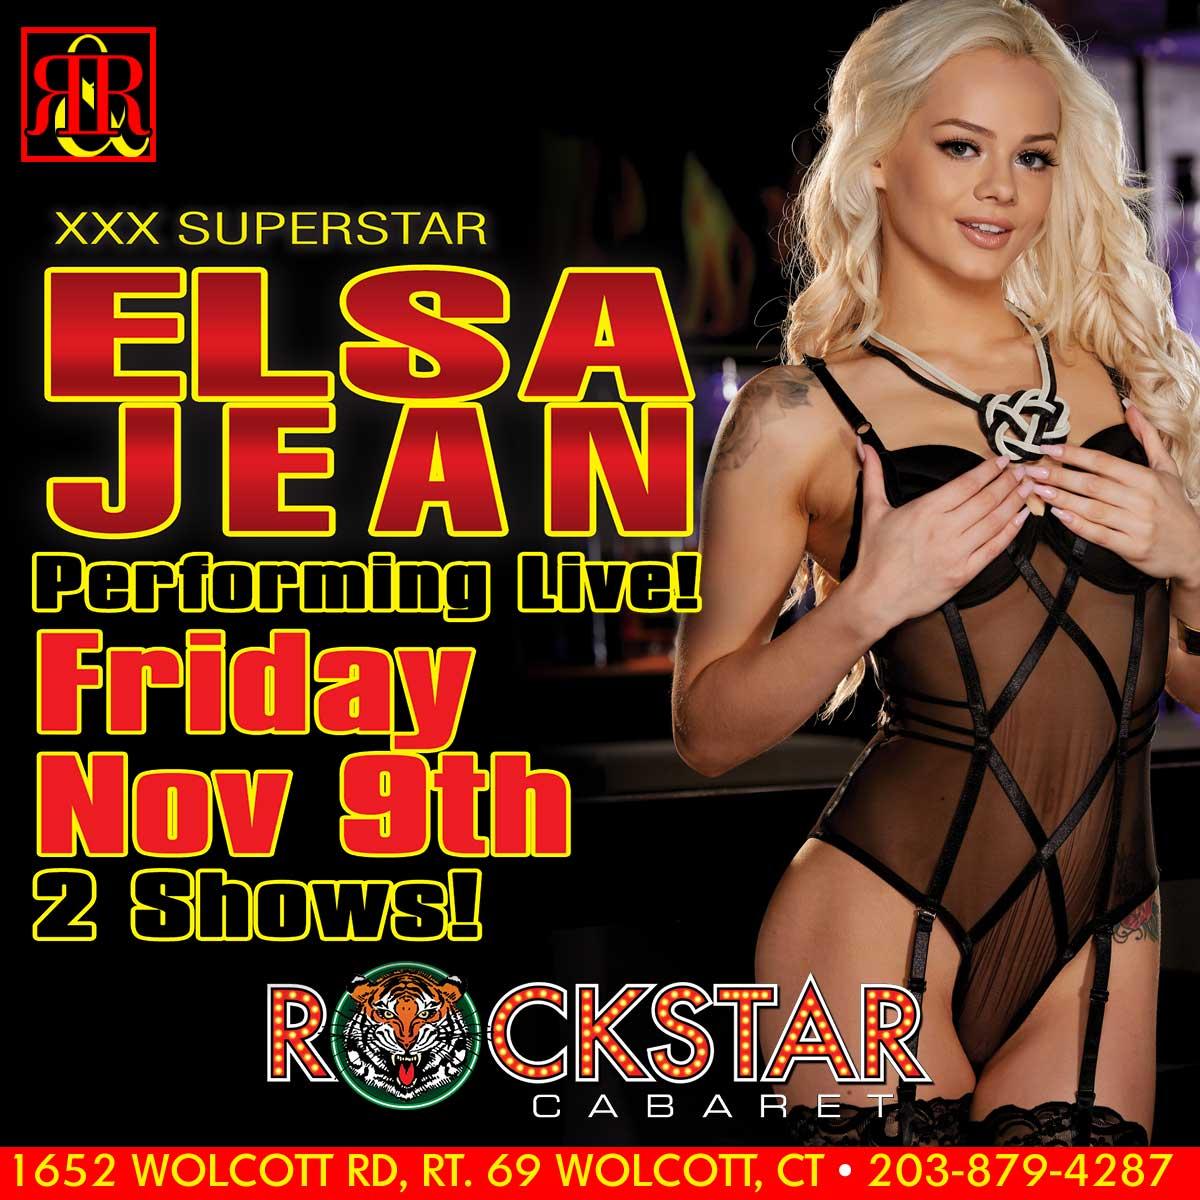 Elsa Jean | Rockstar Strip Club Connecticut